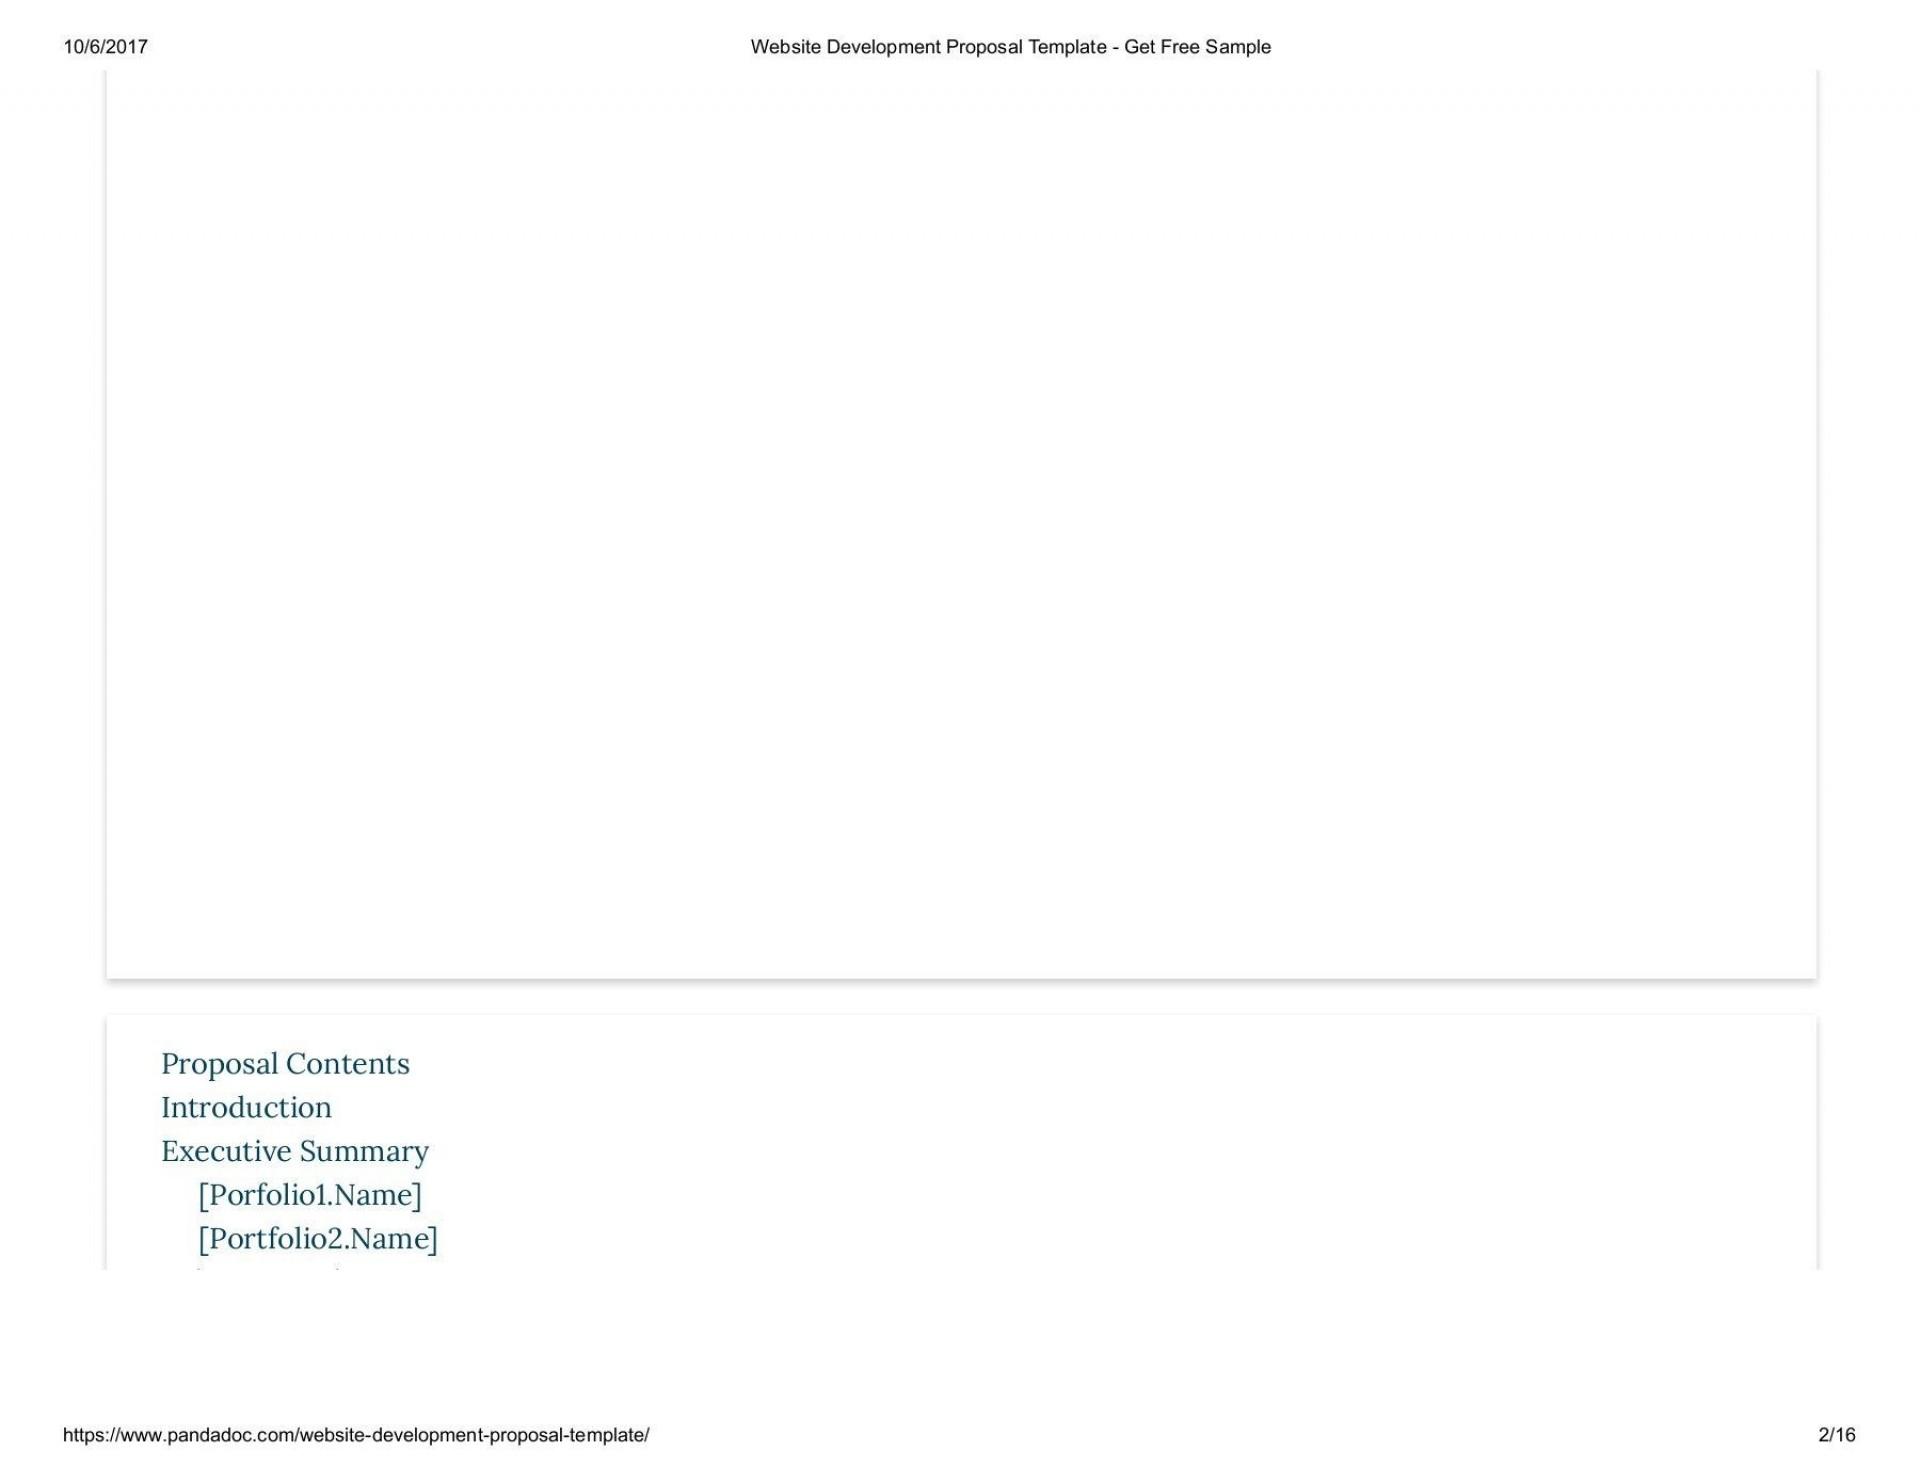 002 Fantastic Website Development Proposal Template Free Image  Word1920